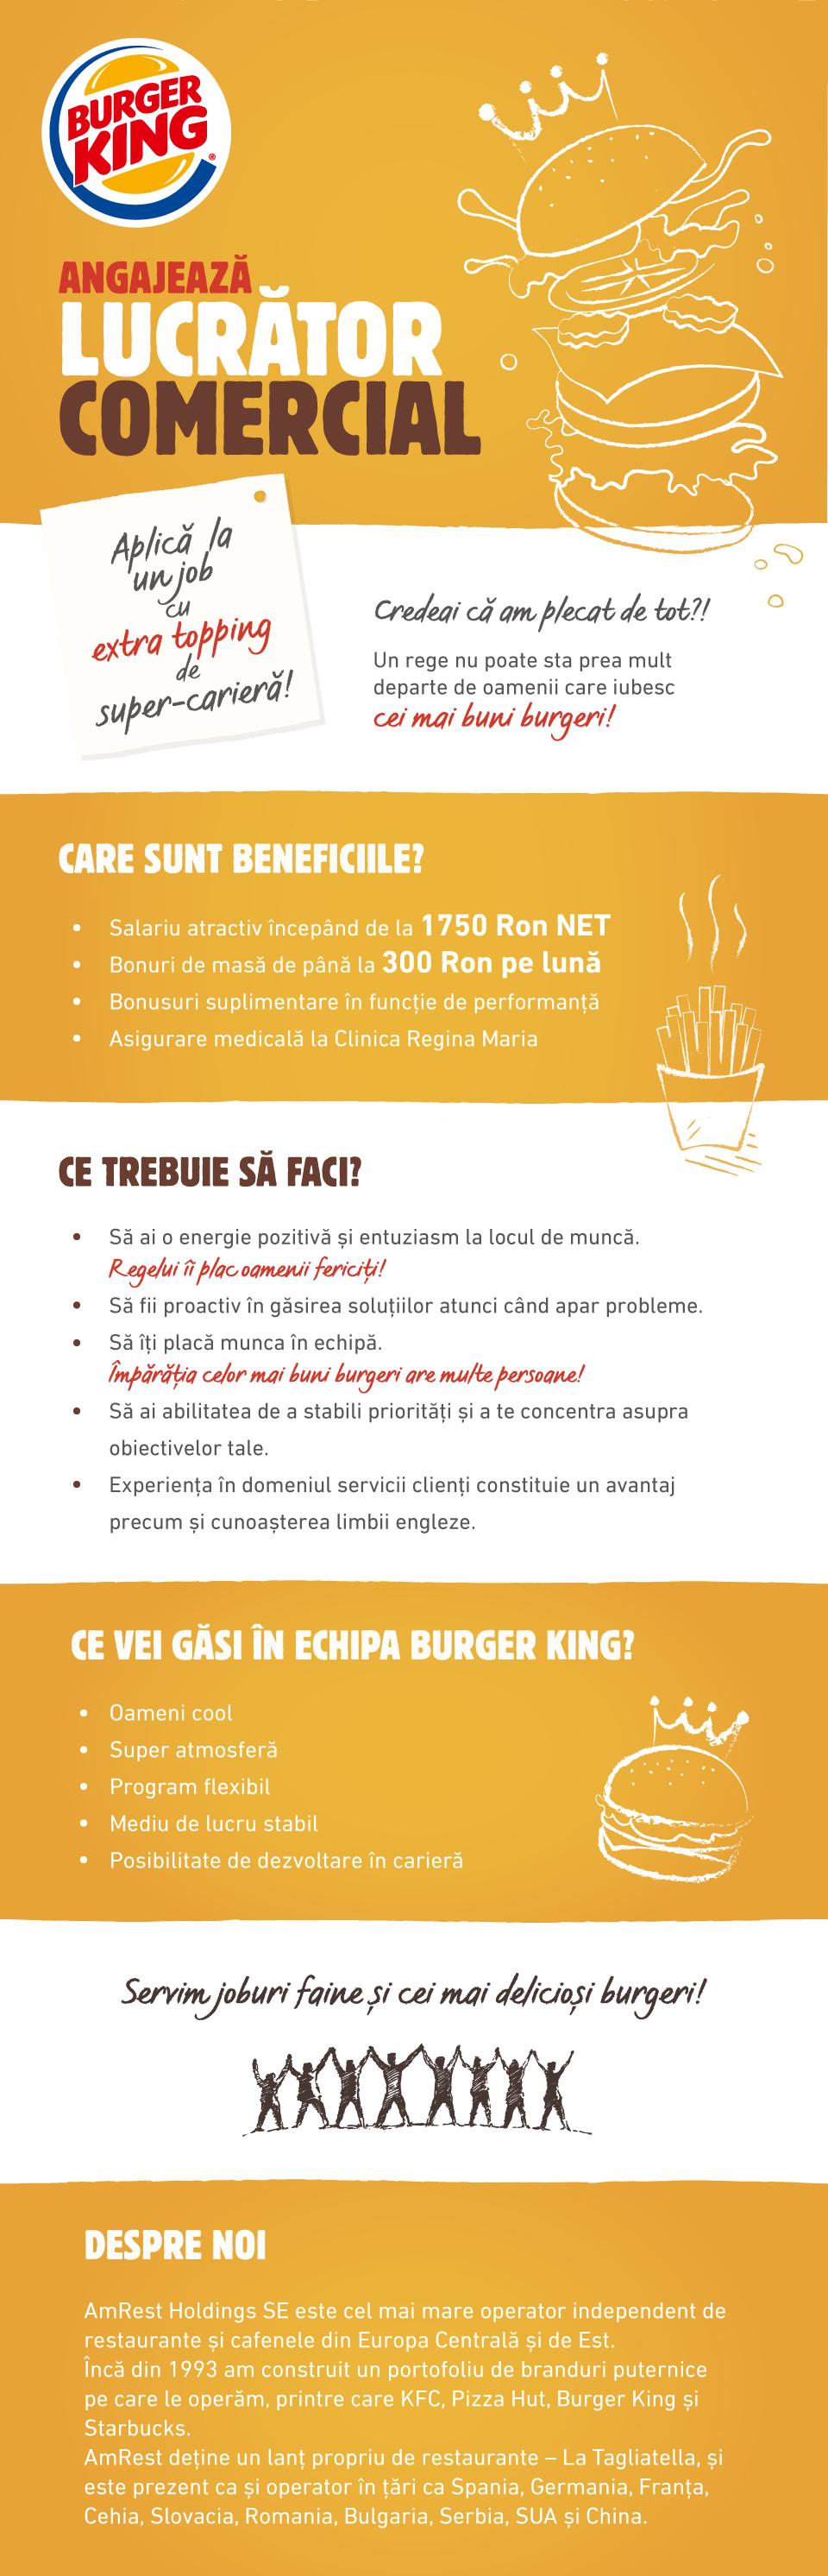 Burger King Lucrator Comercial